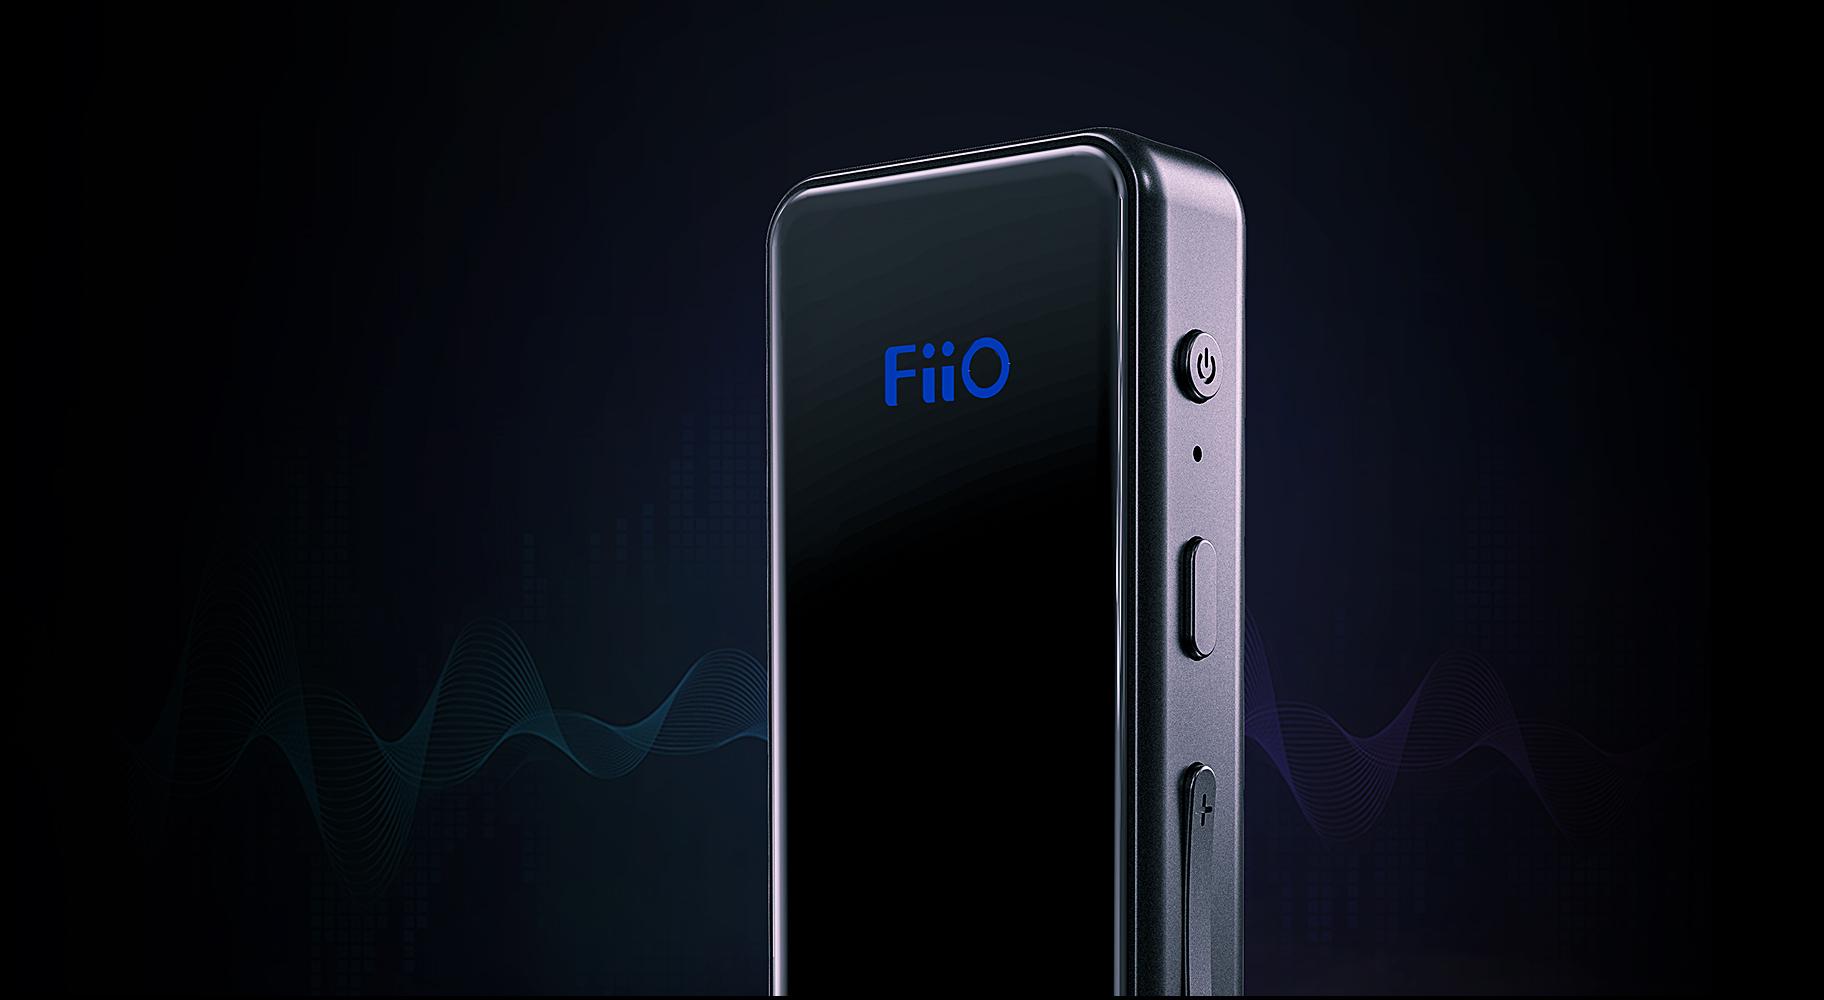 FiiO High-Fidelity Bluetooth Amp BTR3